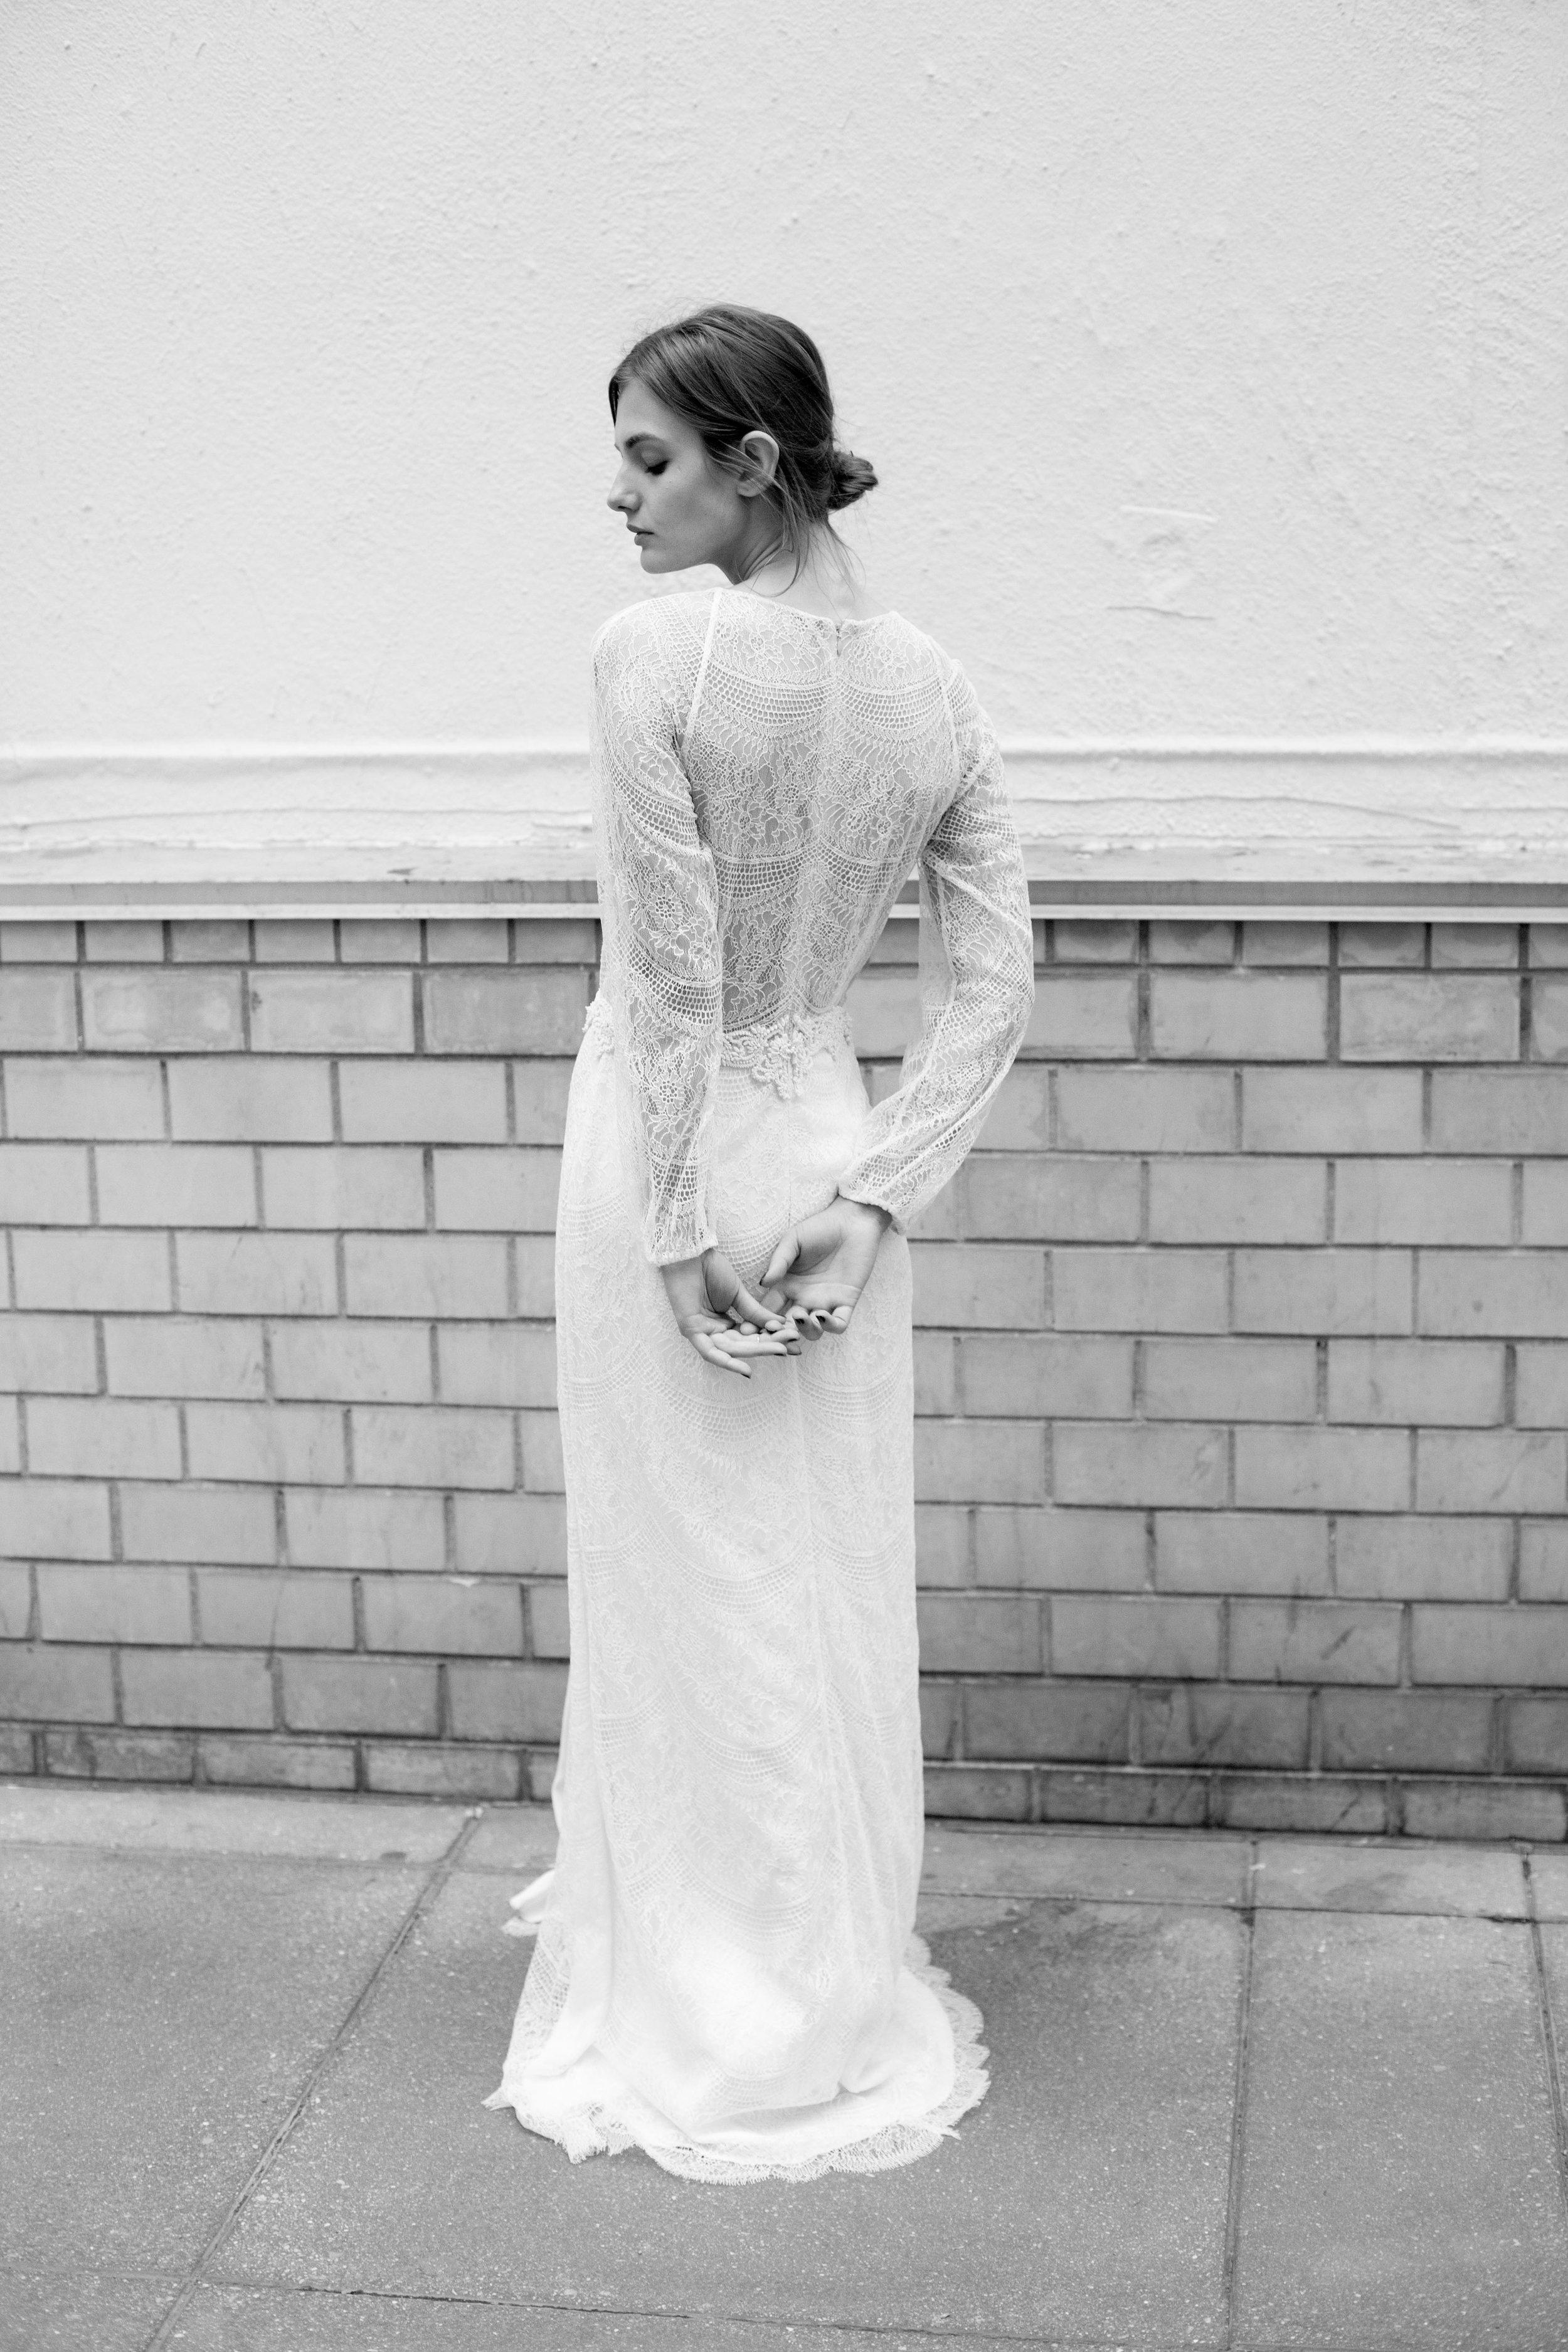 17.Samantha Sleeper - Natalie Probst Photography 118.jpg